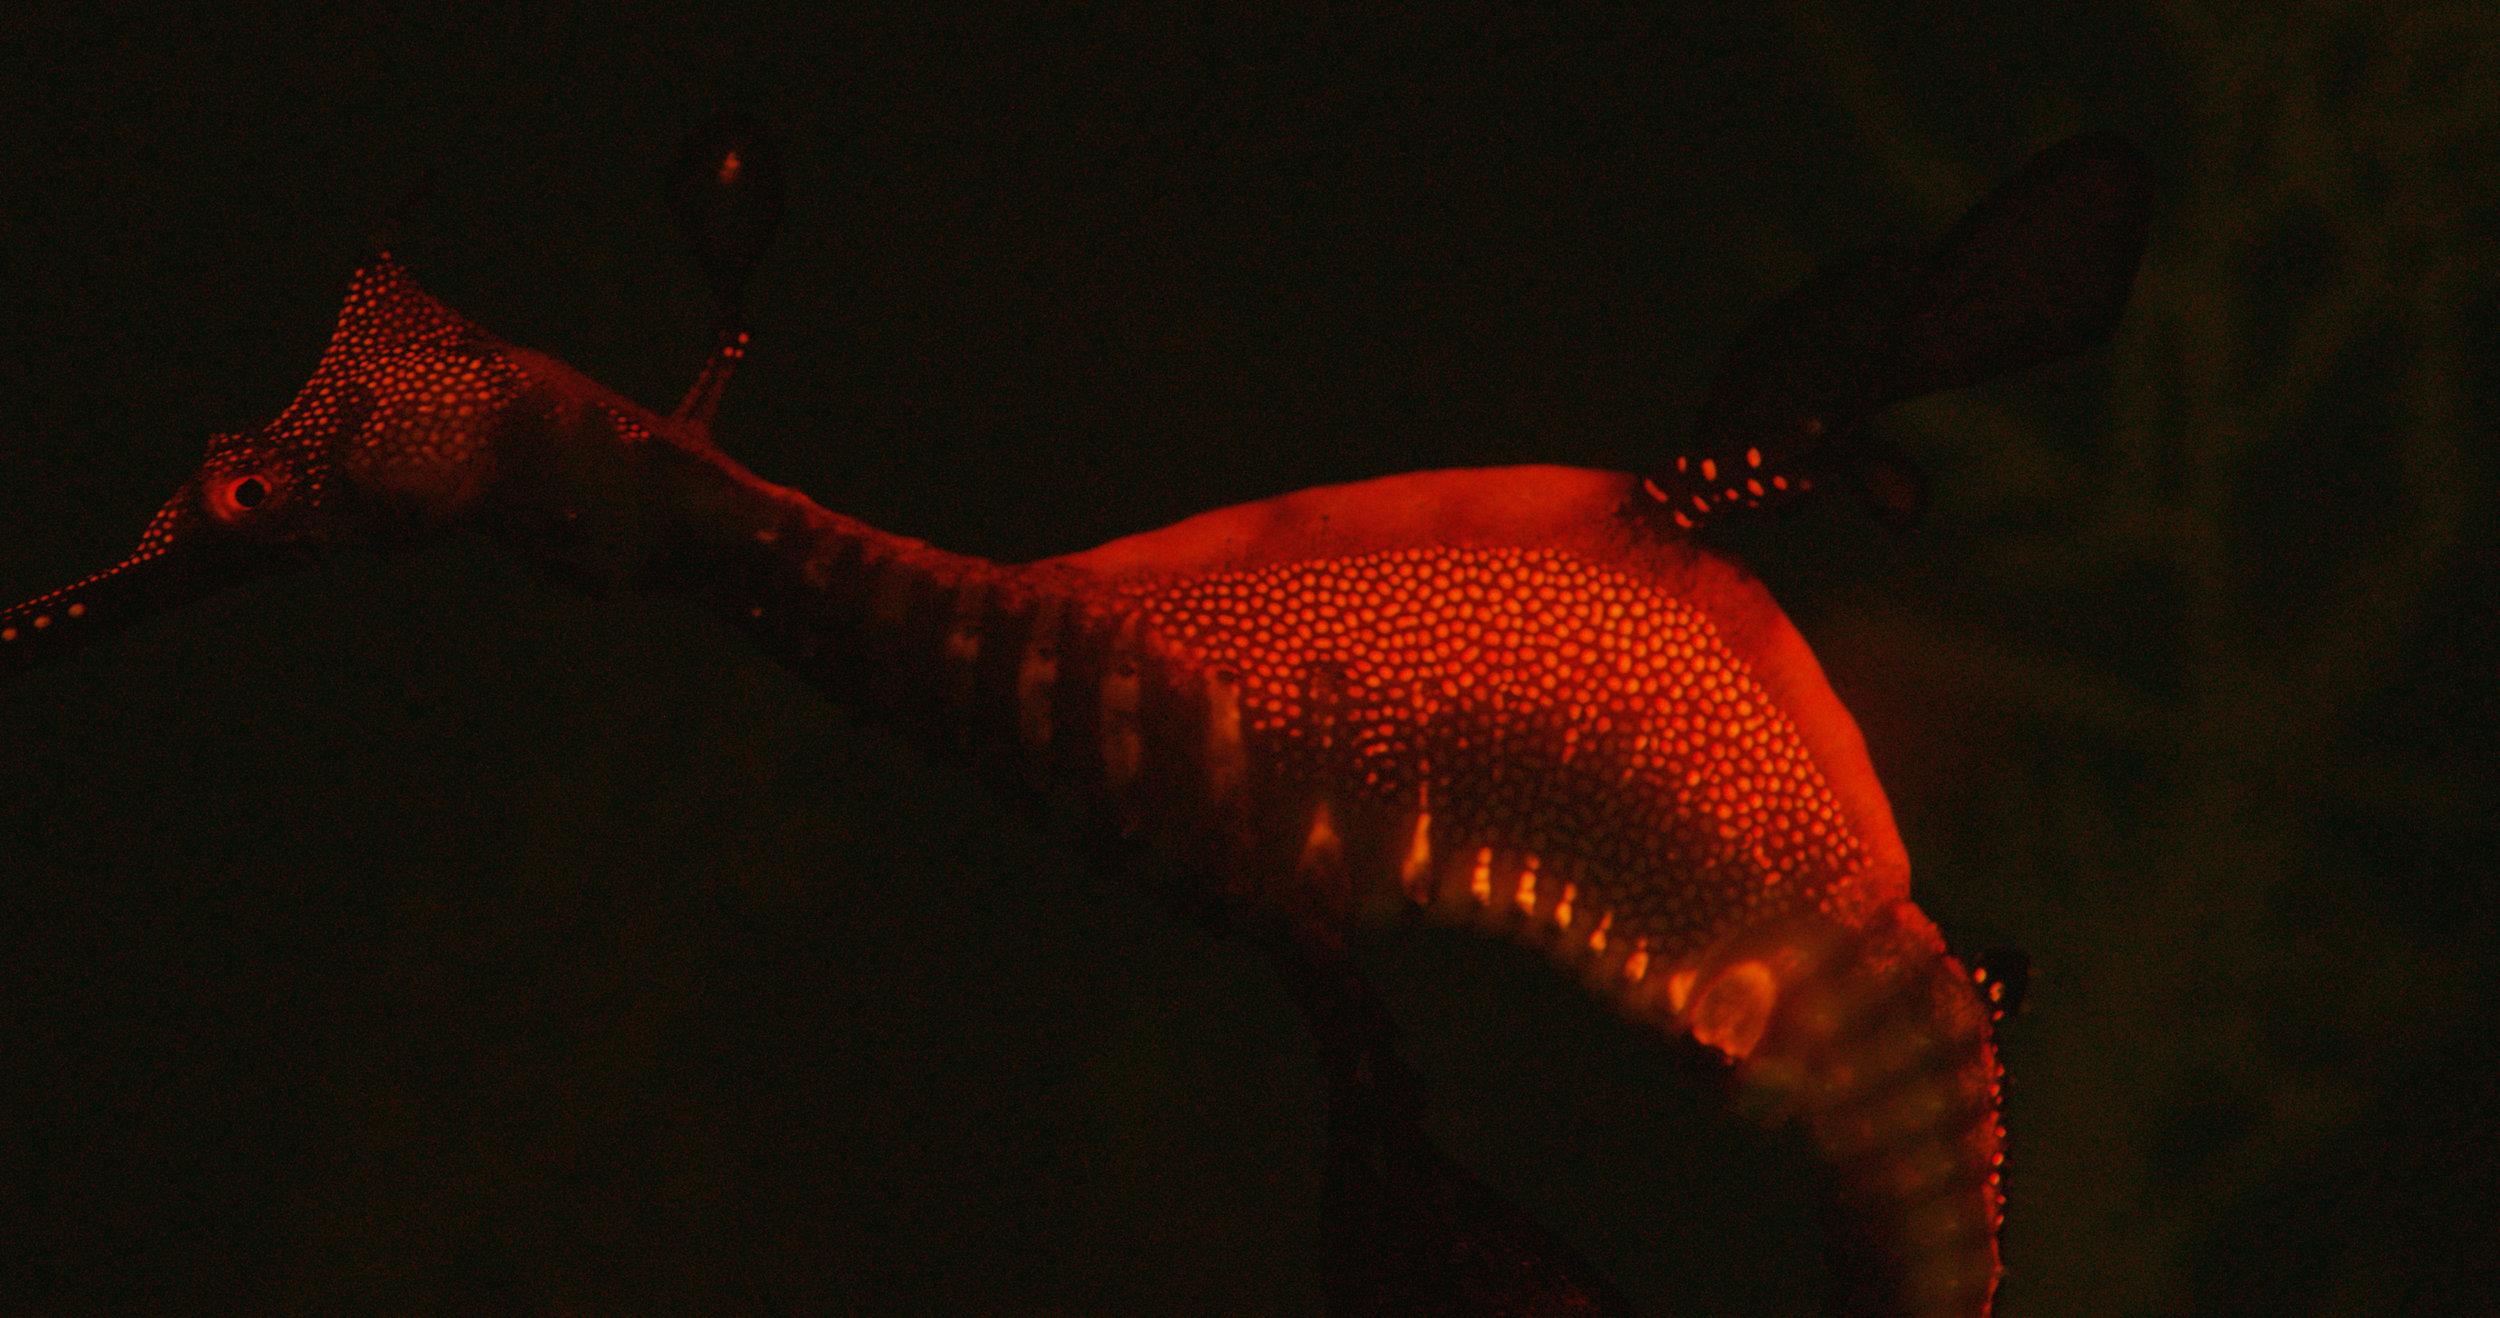 Biofluorescent Seadragon